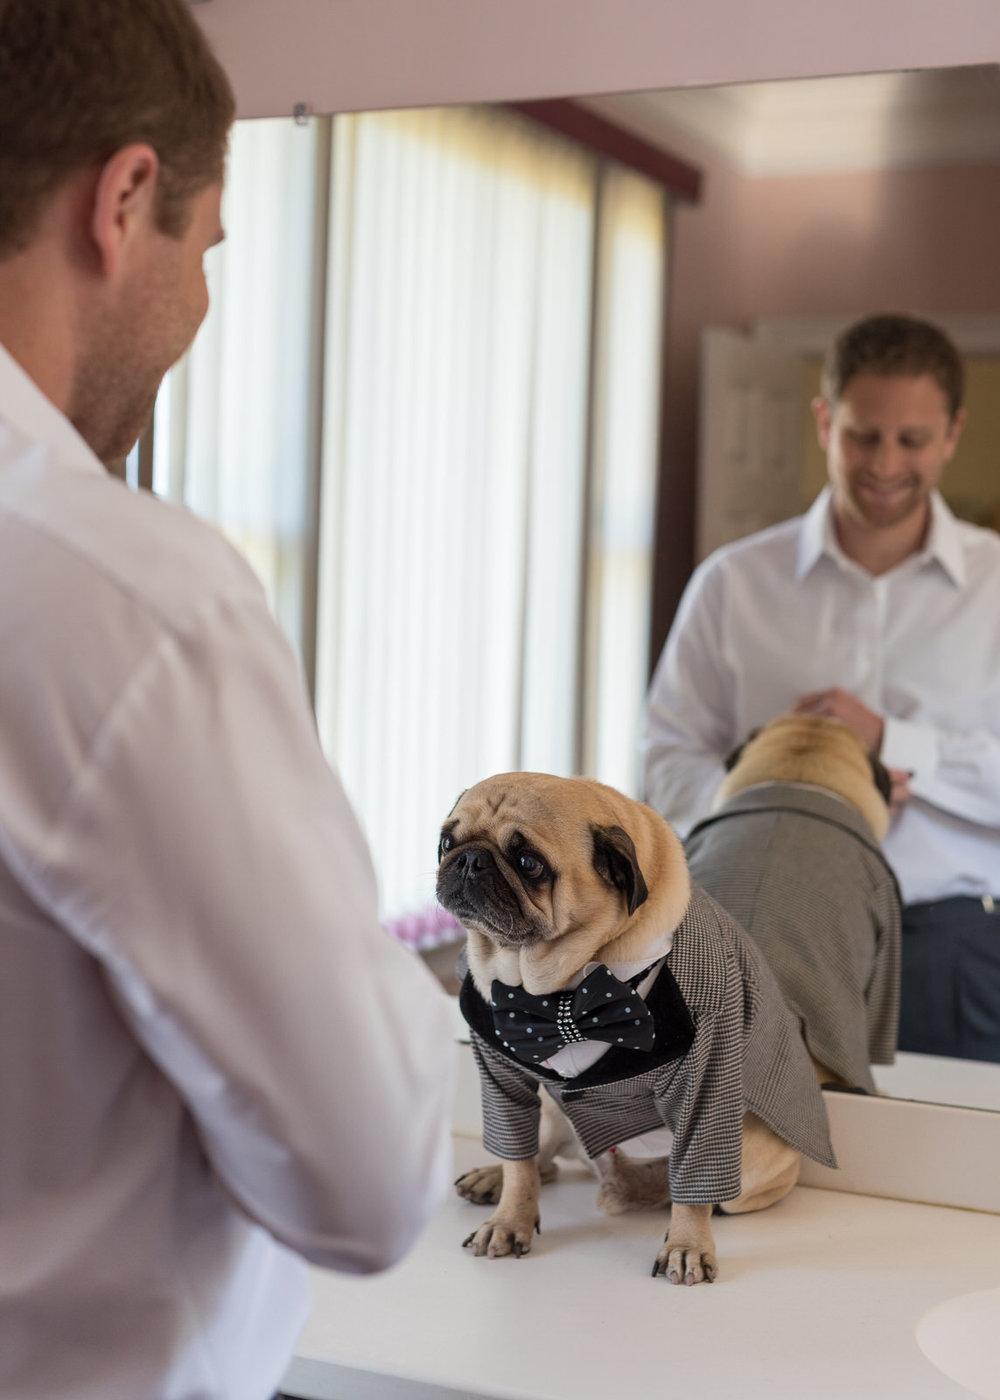 Kennesaw GA, Groom and pet dog at wedding